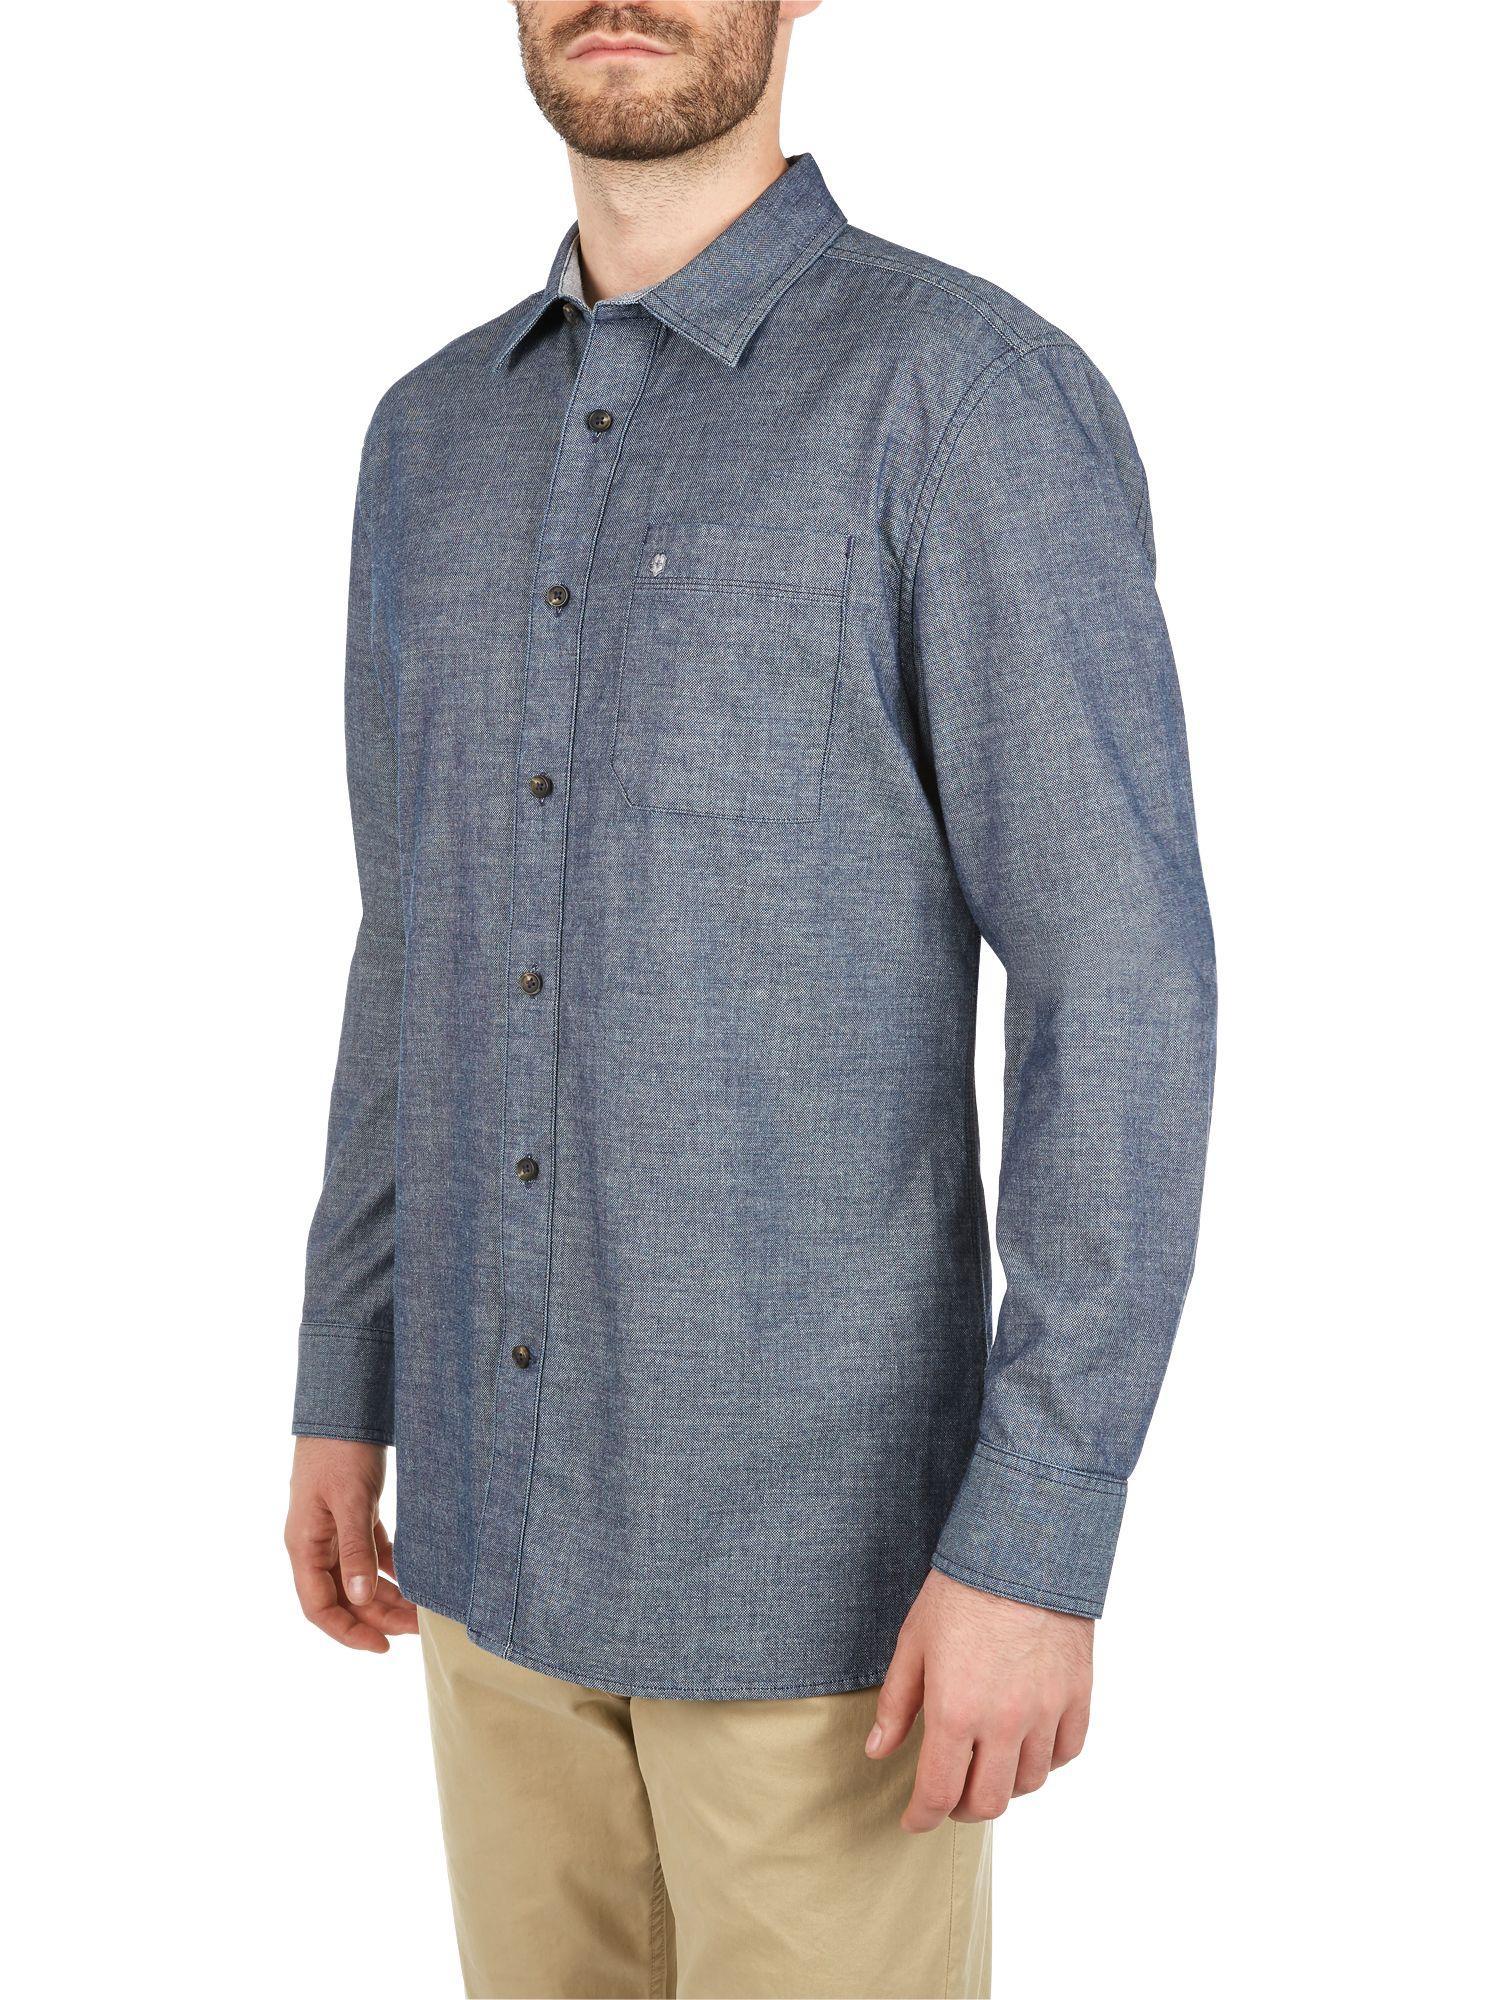 Victorinox Cotton Indigo Dobby L/s Shirt in Blue for Men